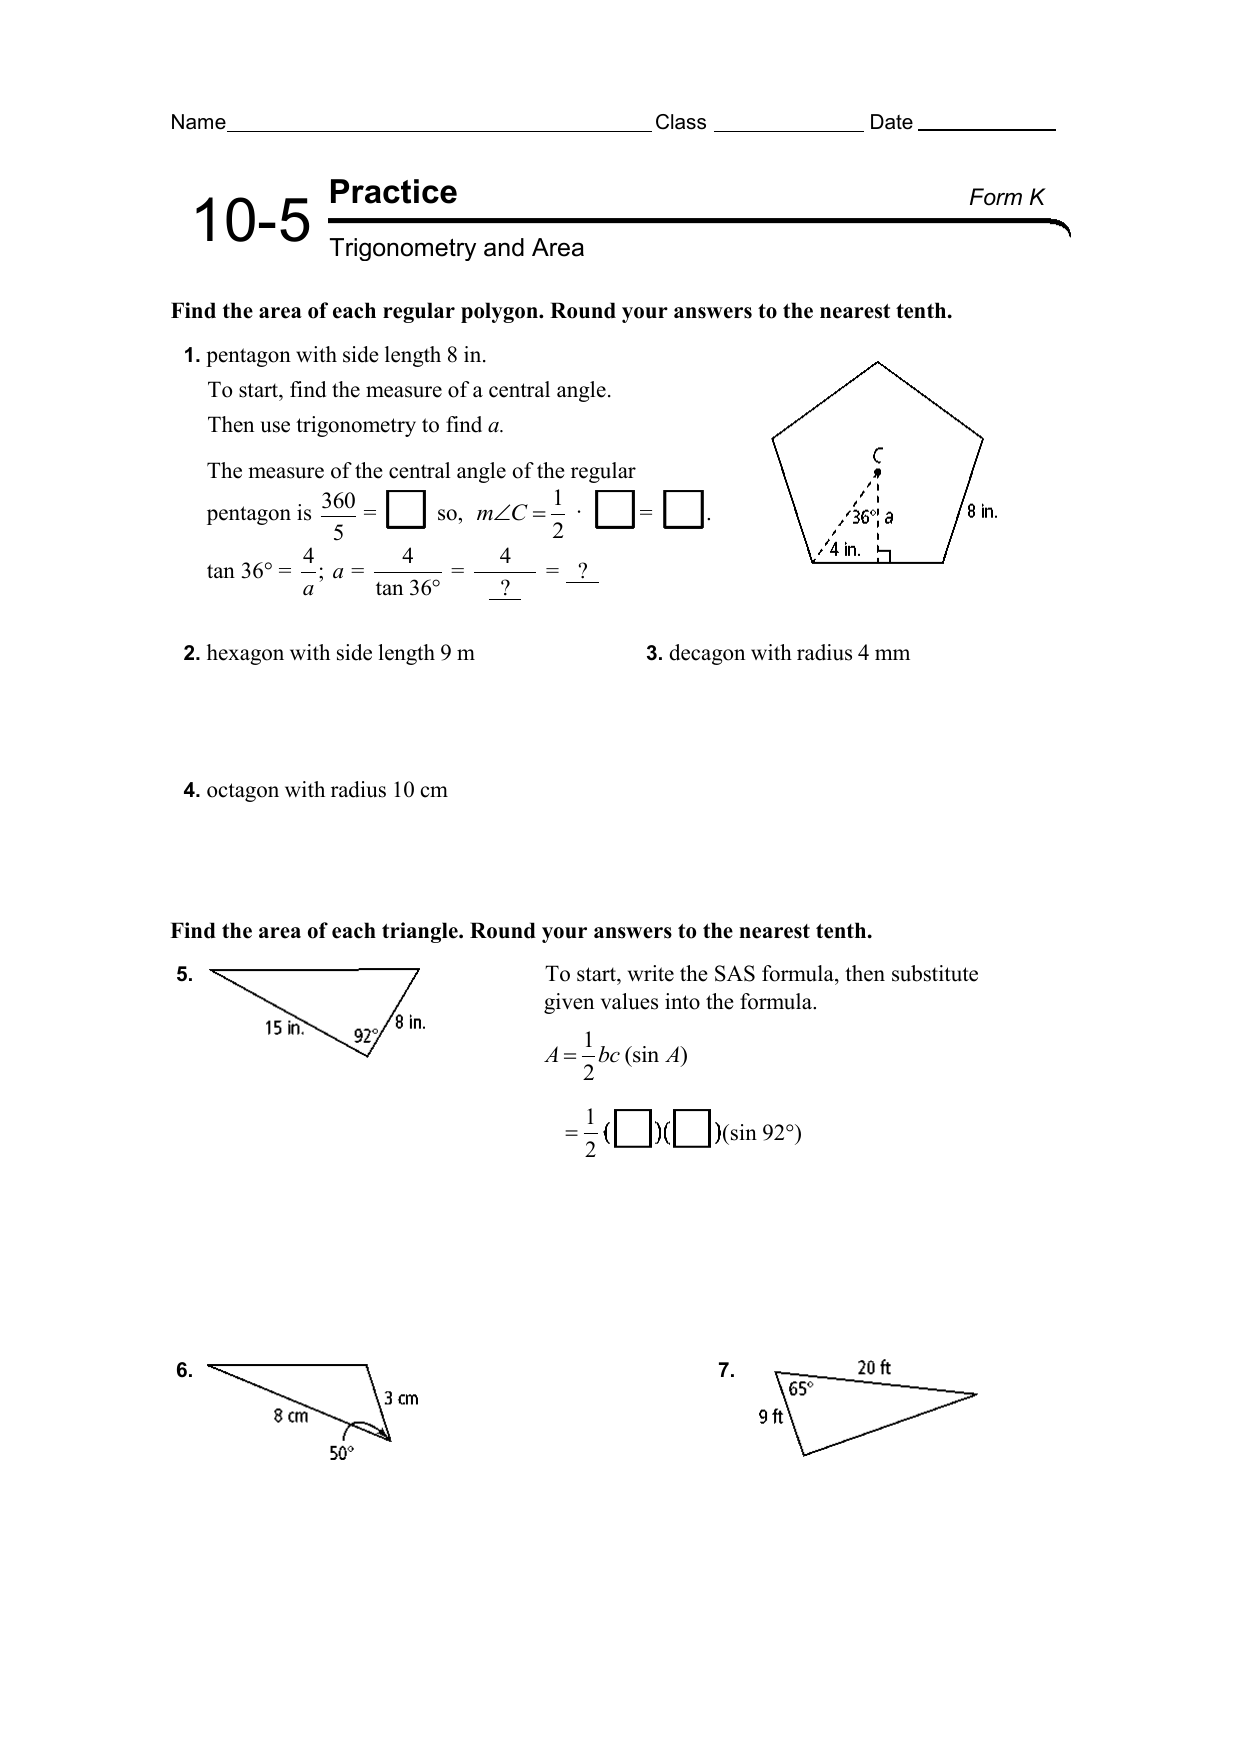 10-5 practice worksheet